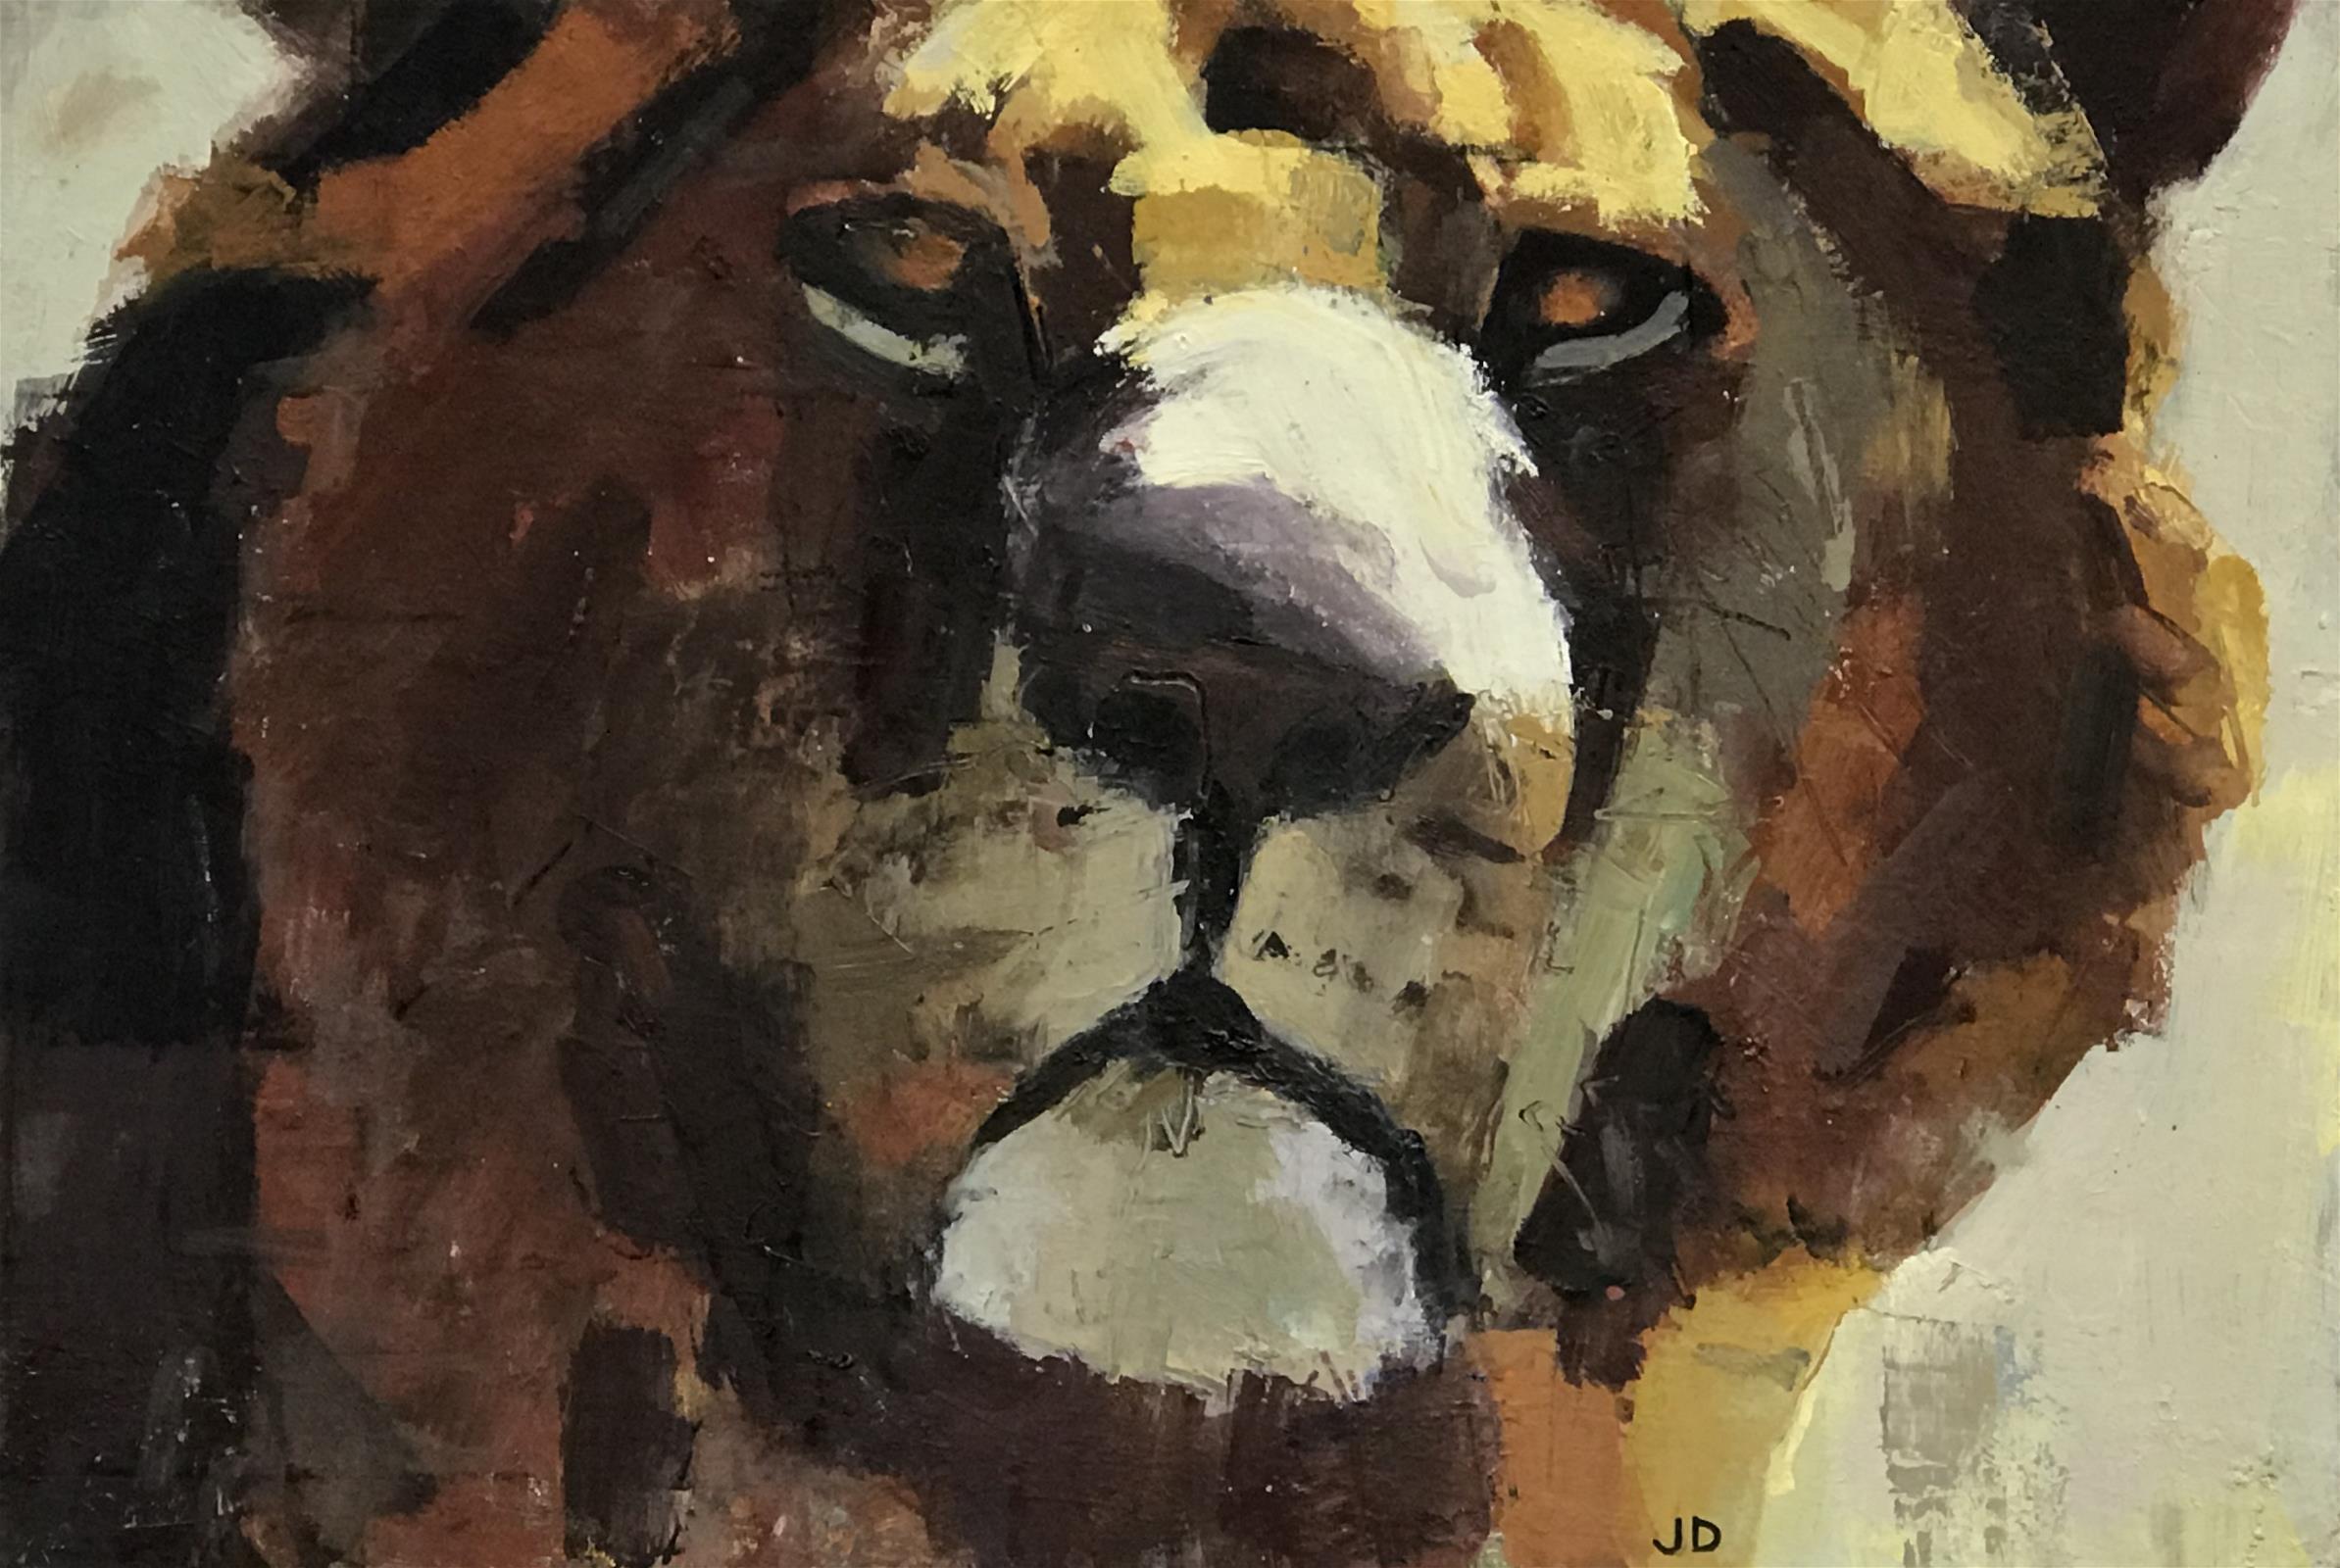 <p>Lion by John Dobbs</p>